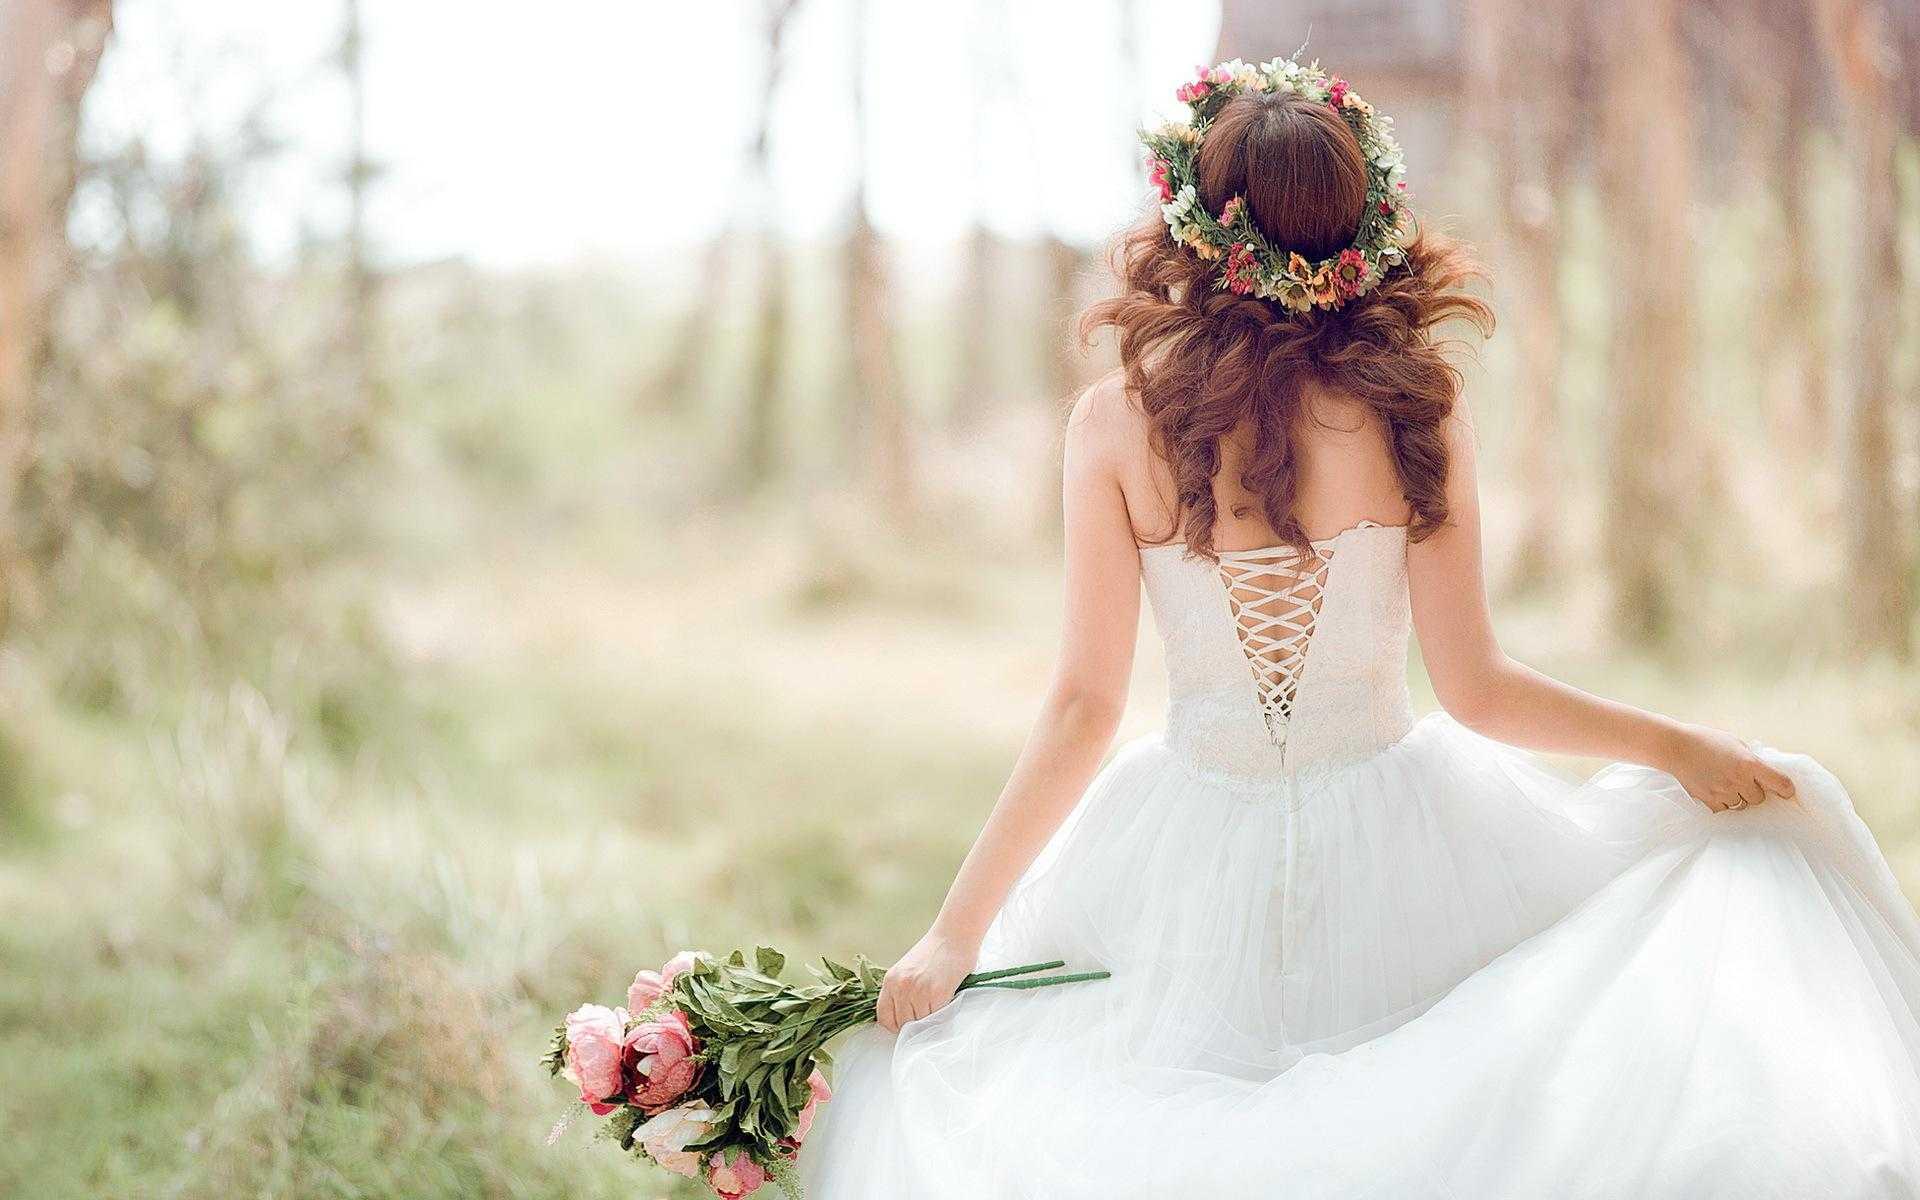 невеста  № 57909 бесплатно